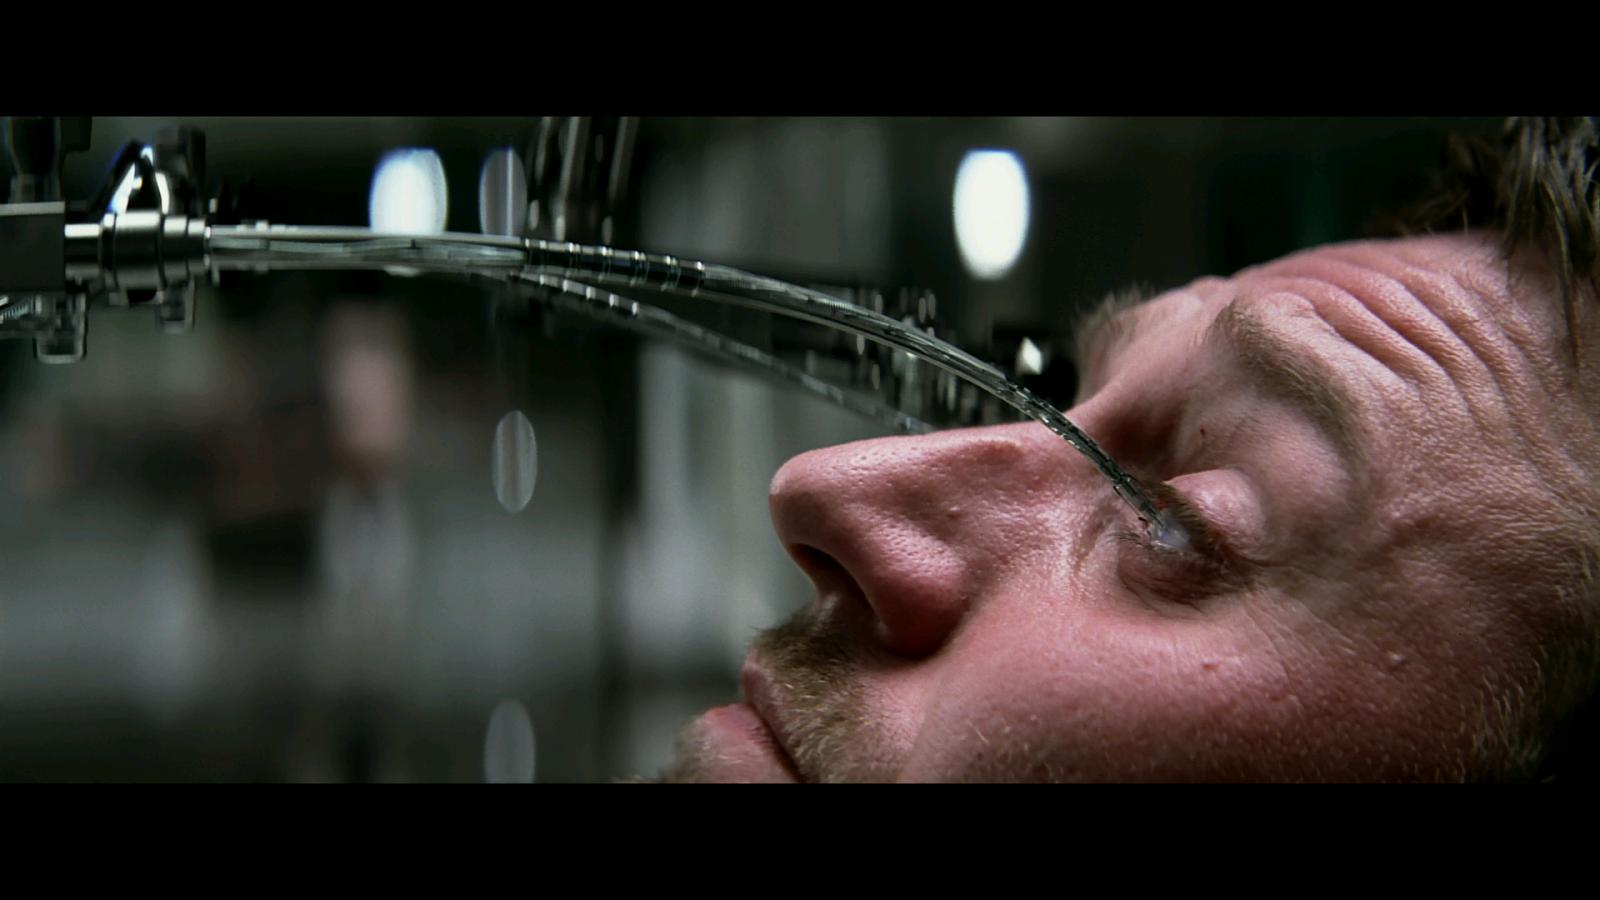 Transcendence (2014) 1080p BD25 5